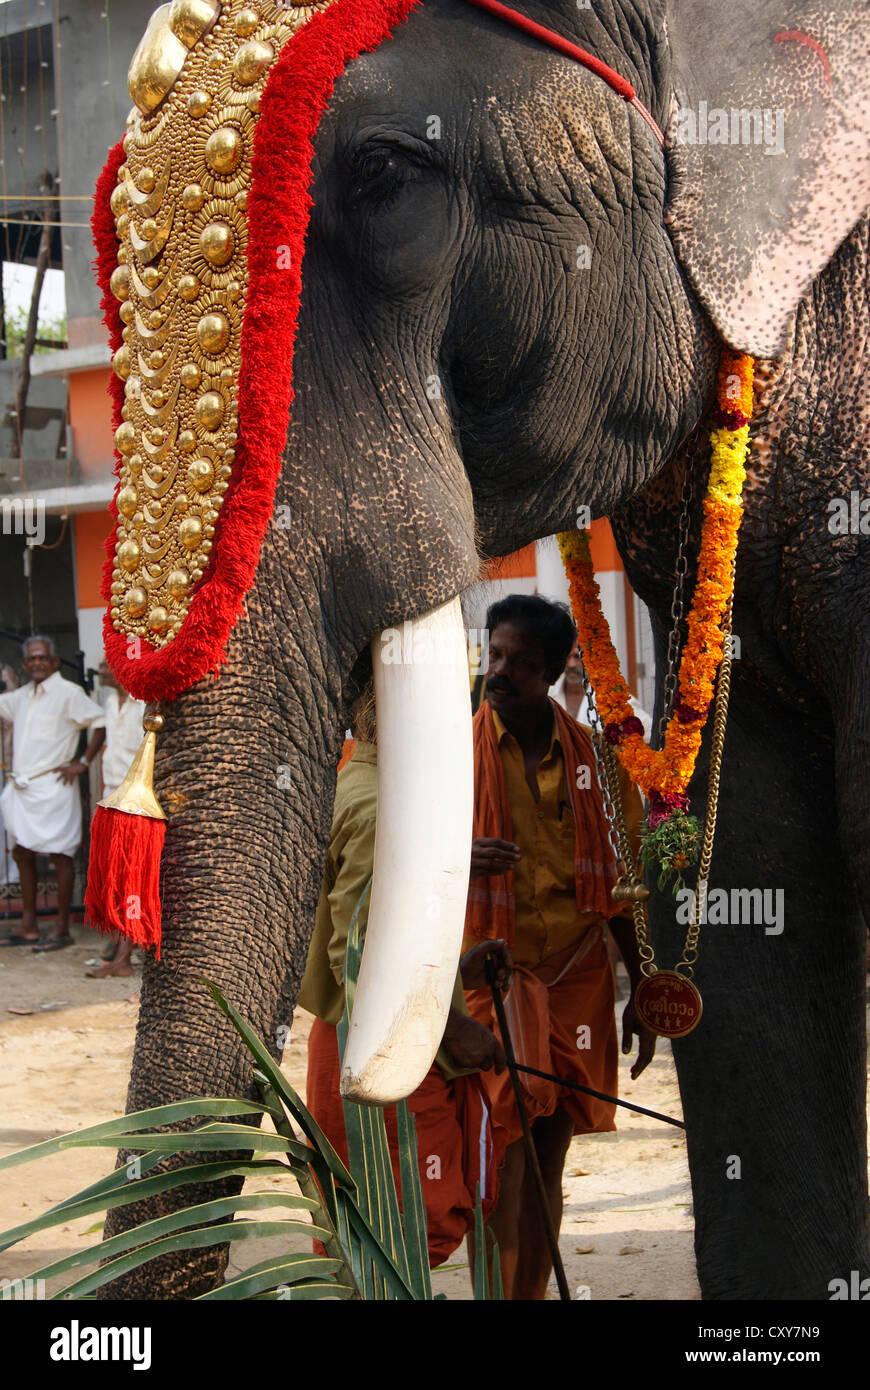 Kerala Decorated Elephant Stock Photos Kerala Decorated Elephant